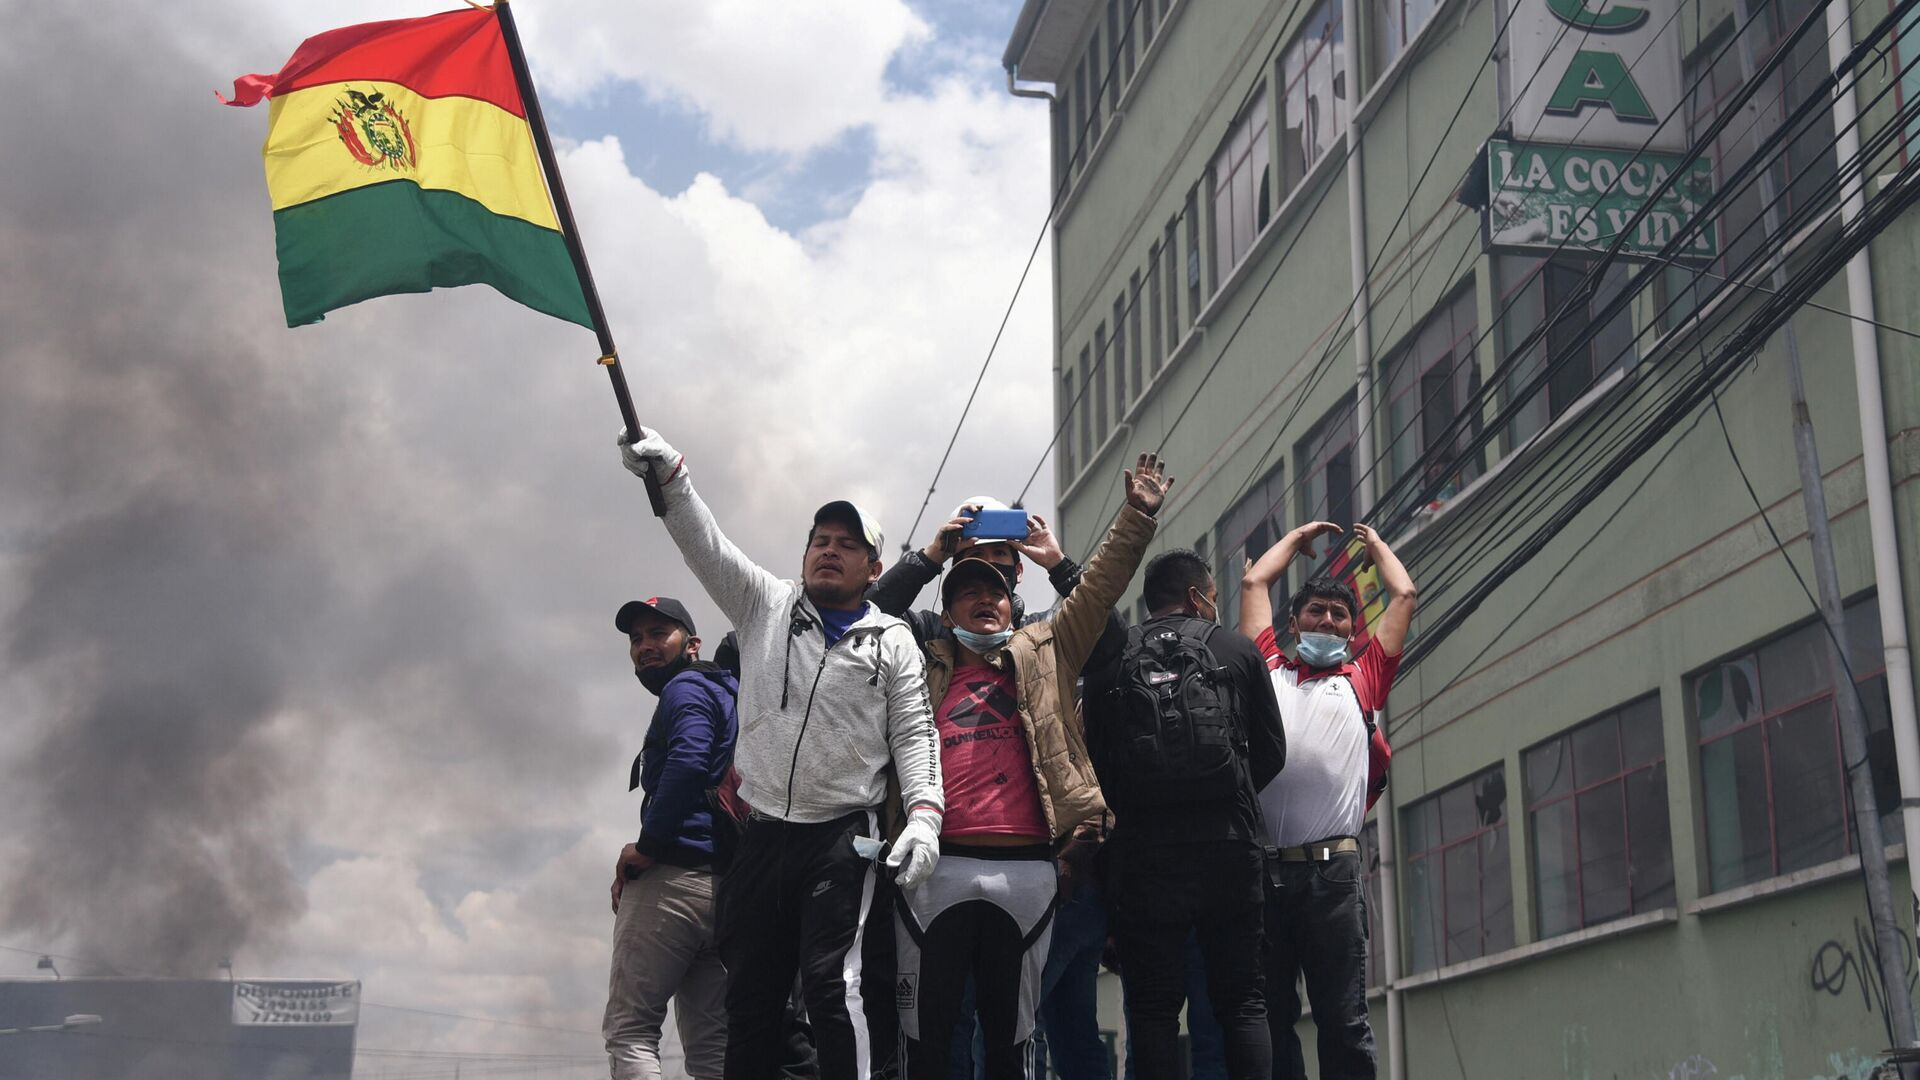 El paro nacional en Bolivia - Sputnik Mundo, 1920, 05.10.2021